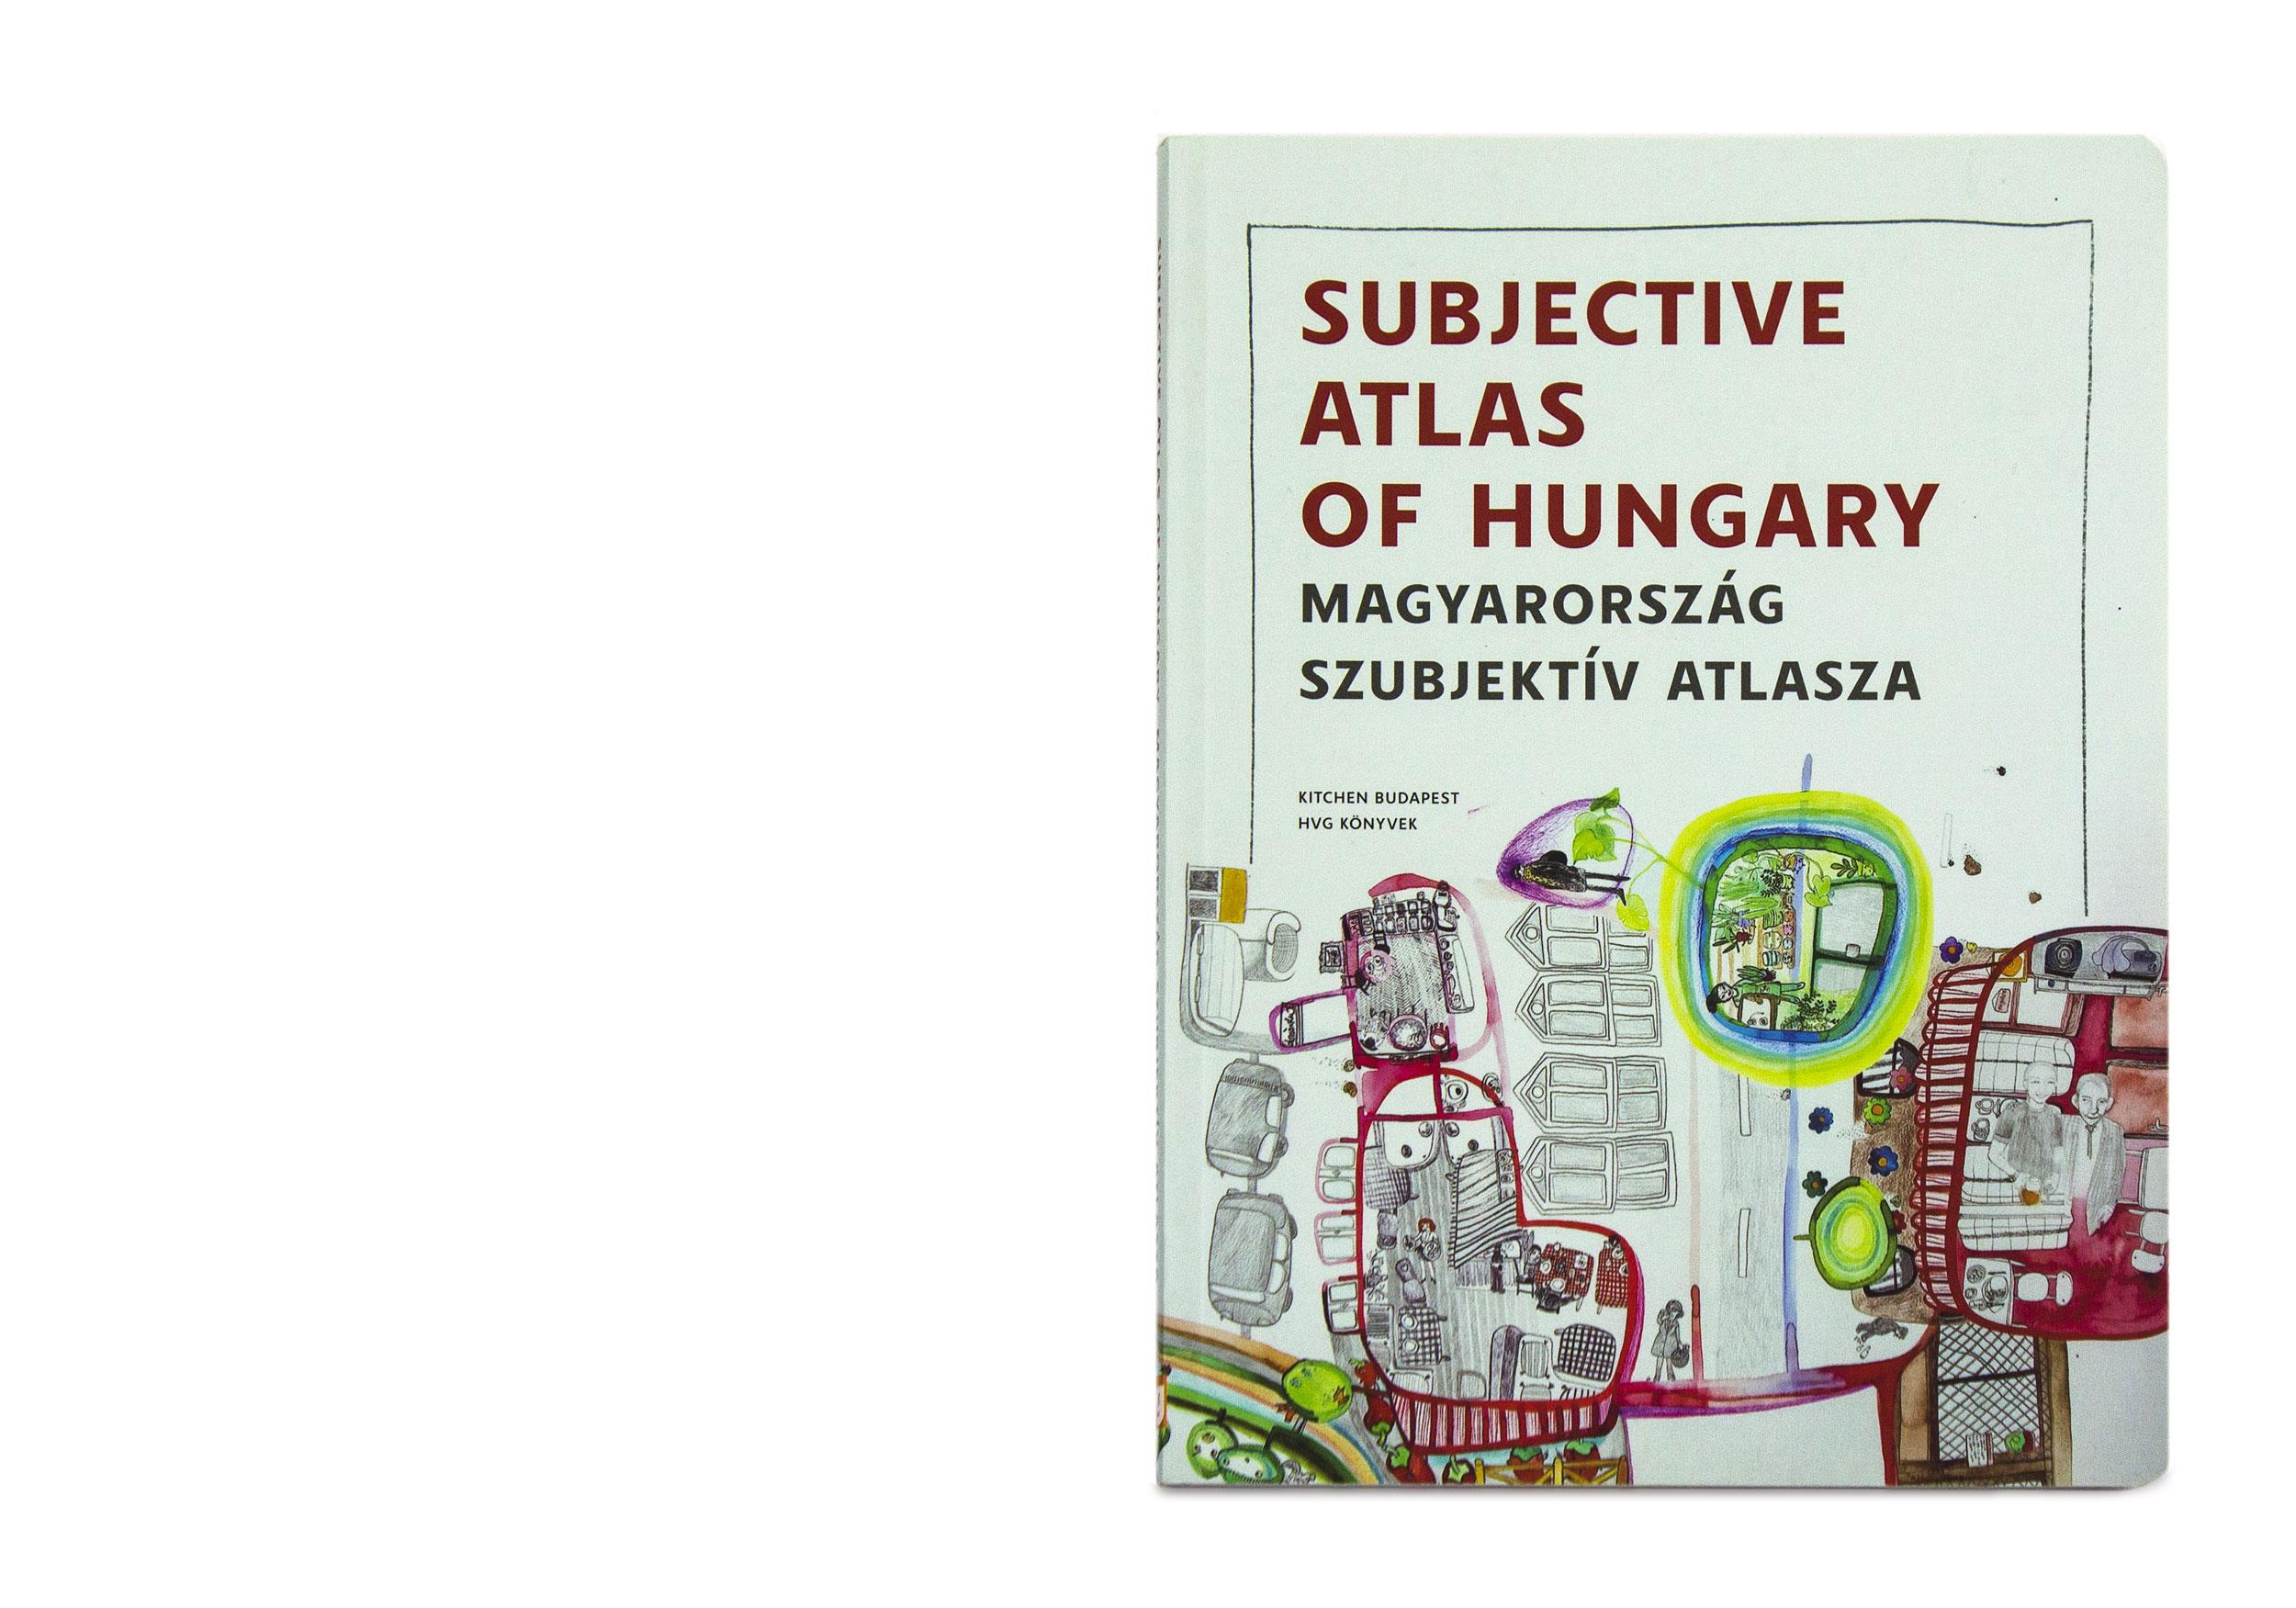 SubjectiveAtlasHungary_01.jpg